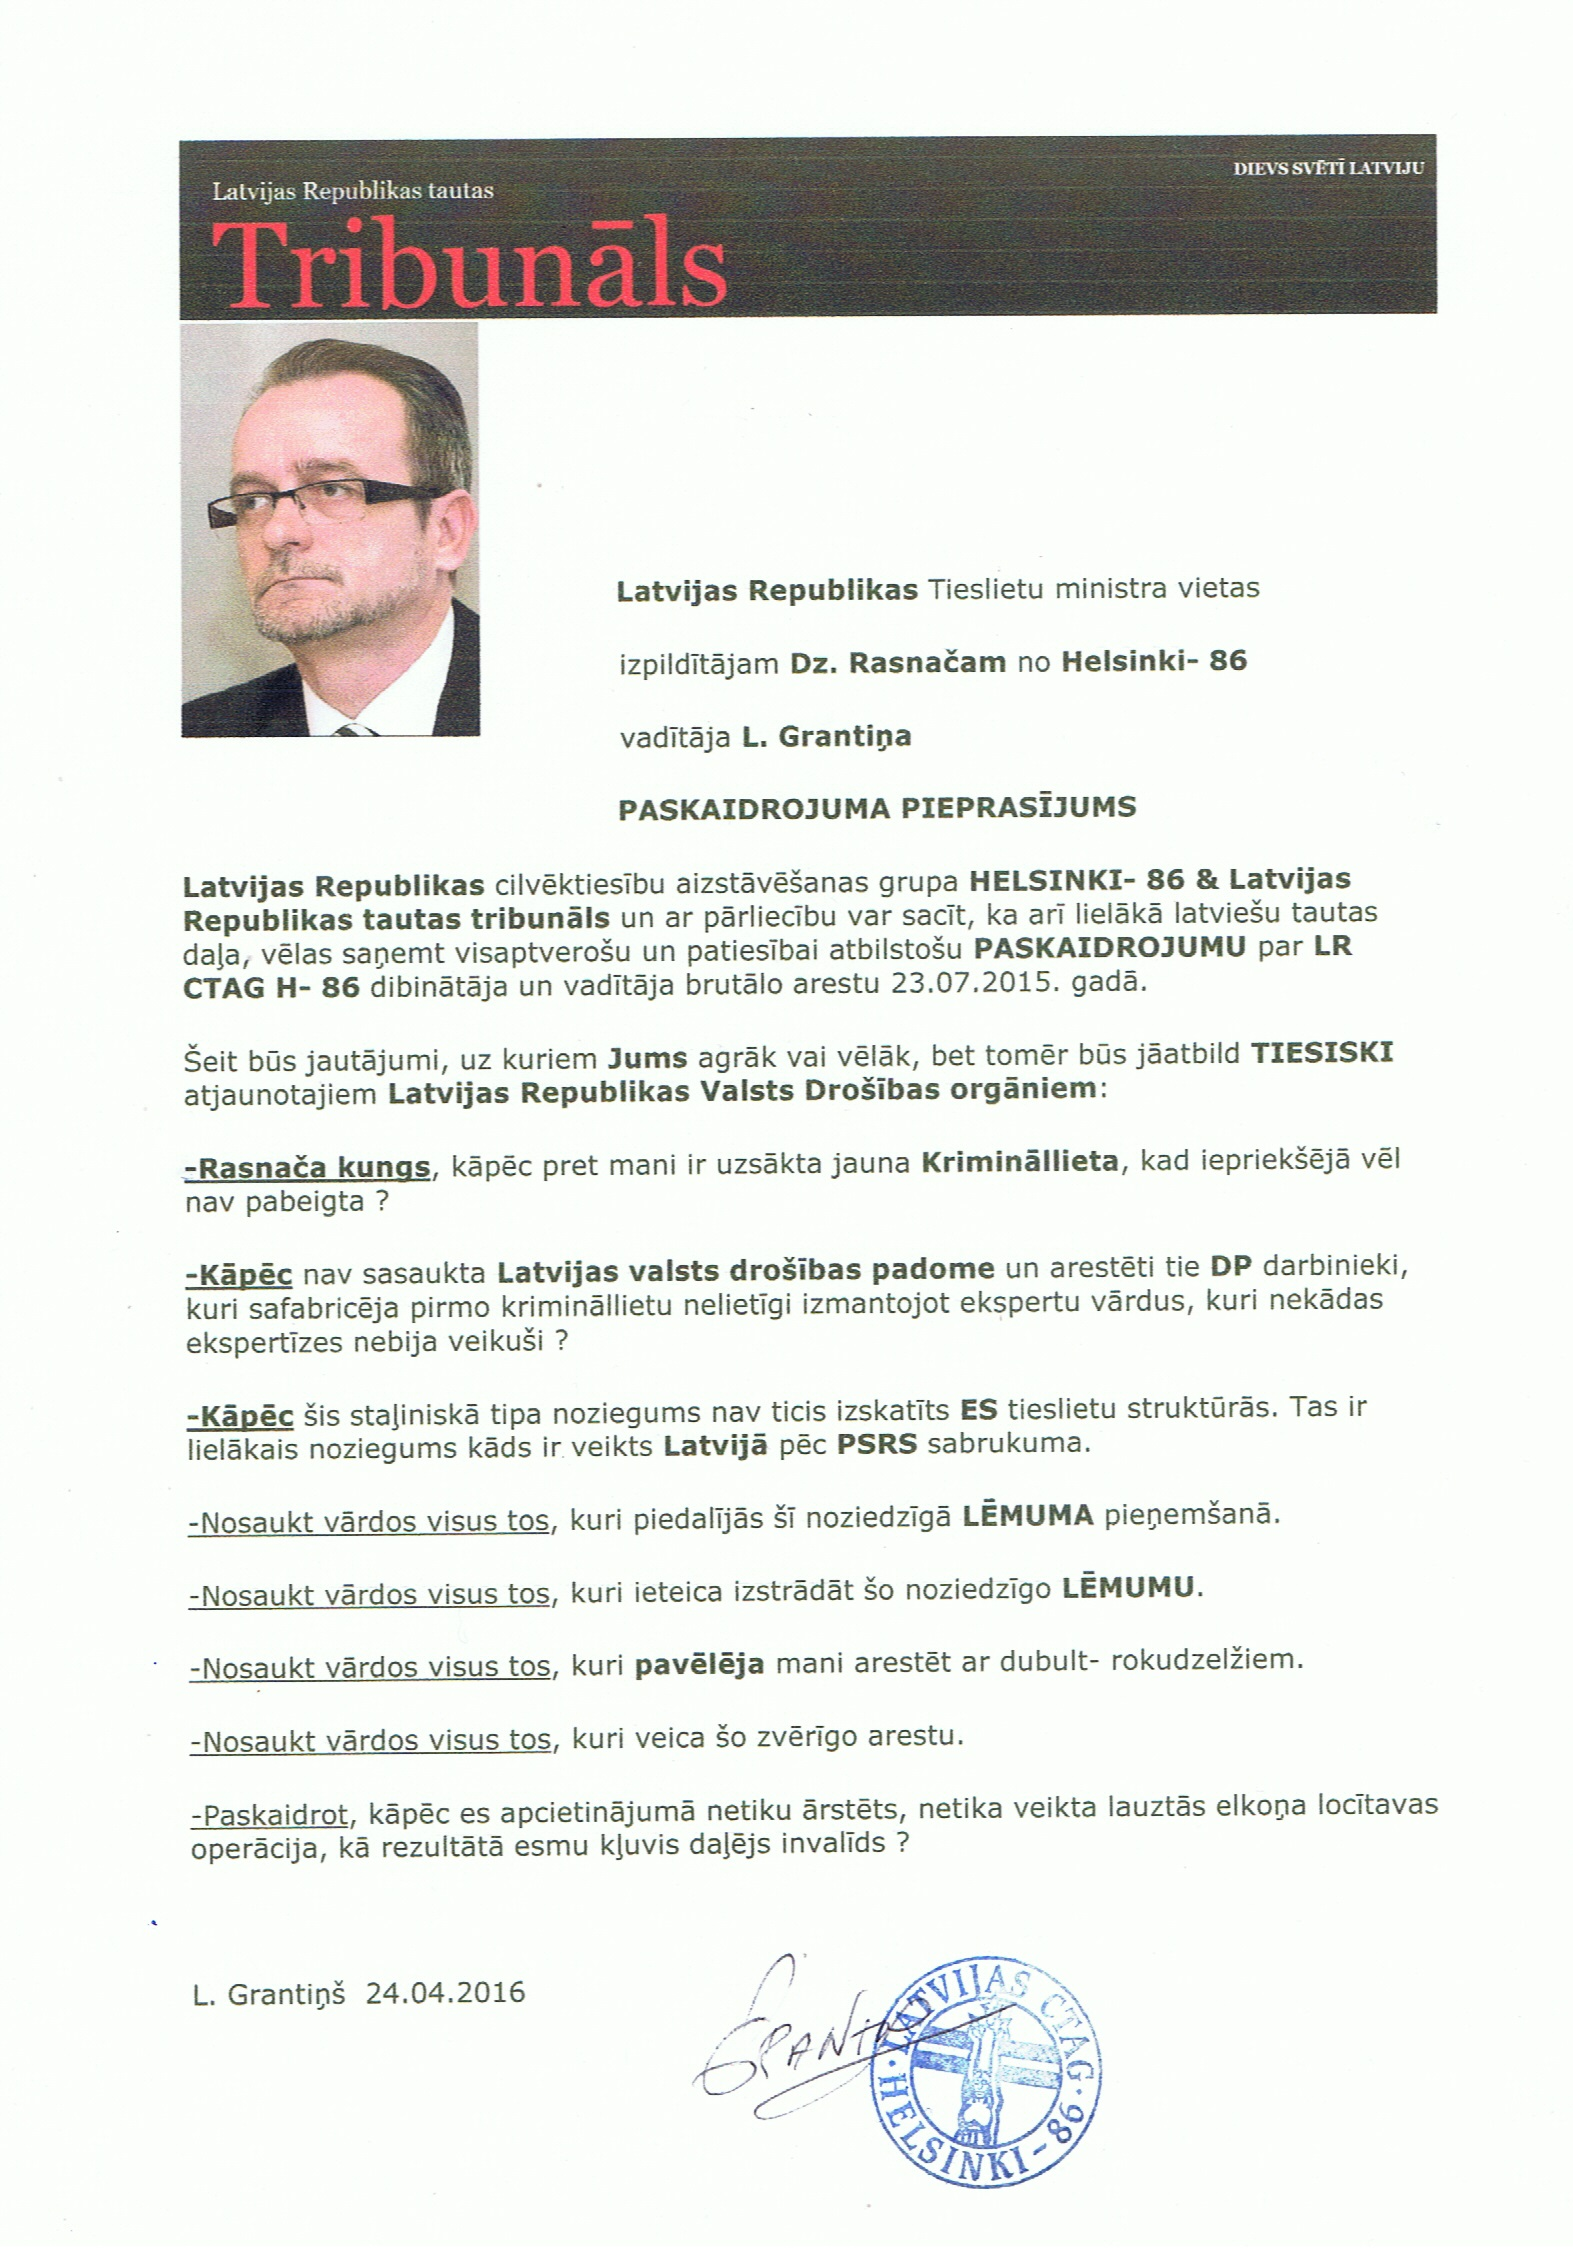 Rasnačs,Grantiņš,LRTT,Helsinki-86,iesalnieks,DP